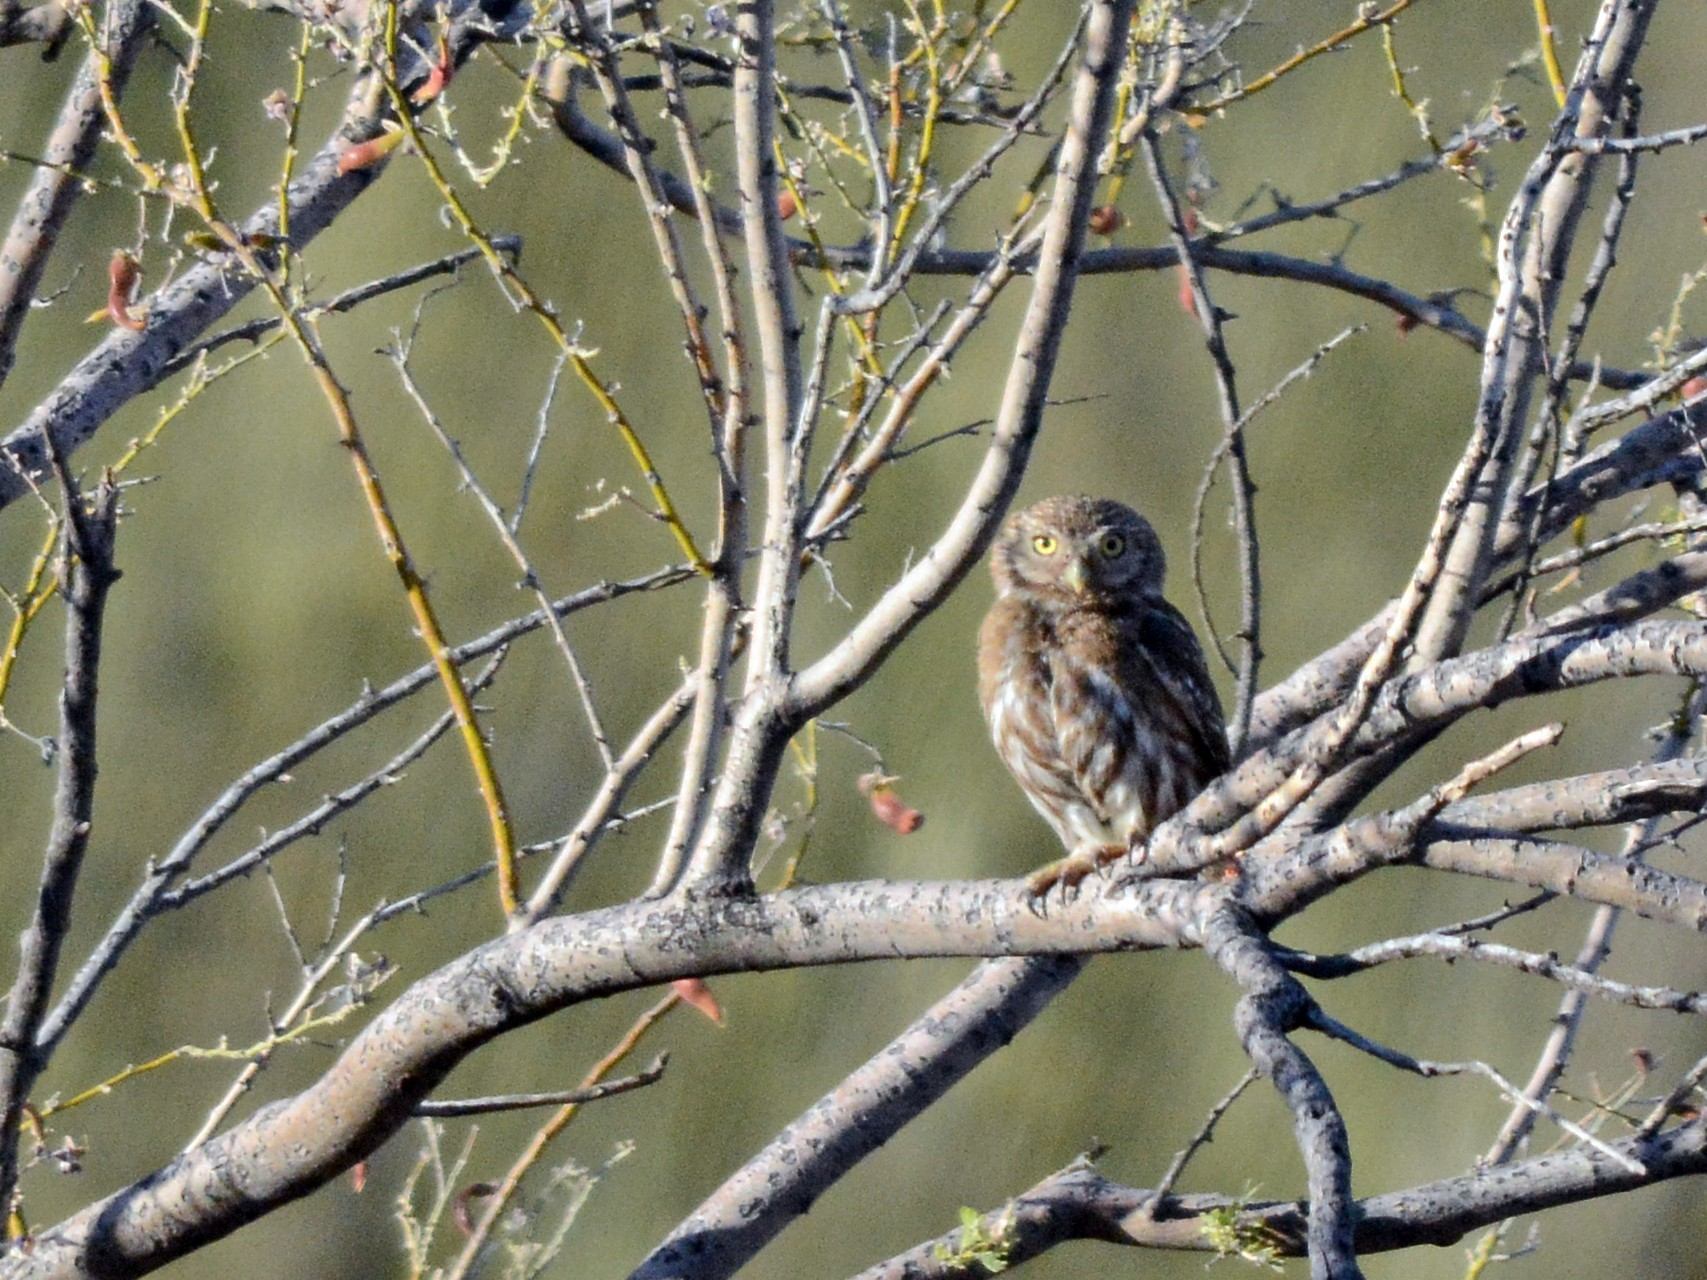 Ferruginous Pygmy-Owl - Walker Noe